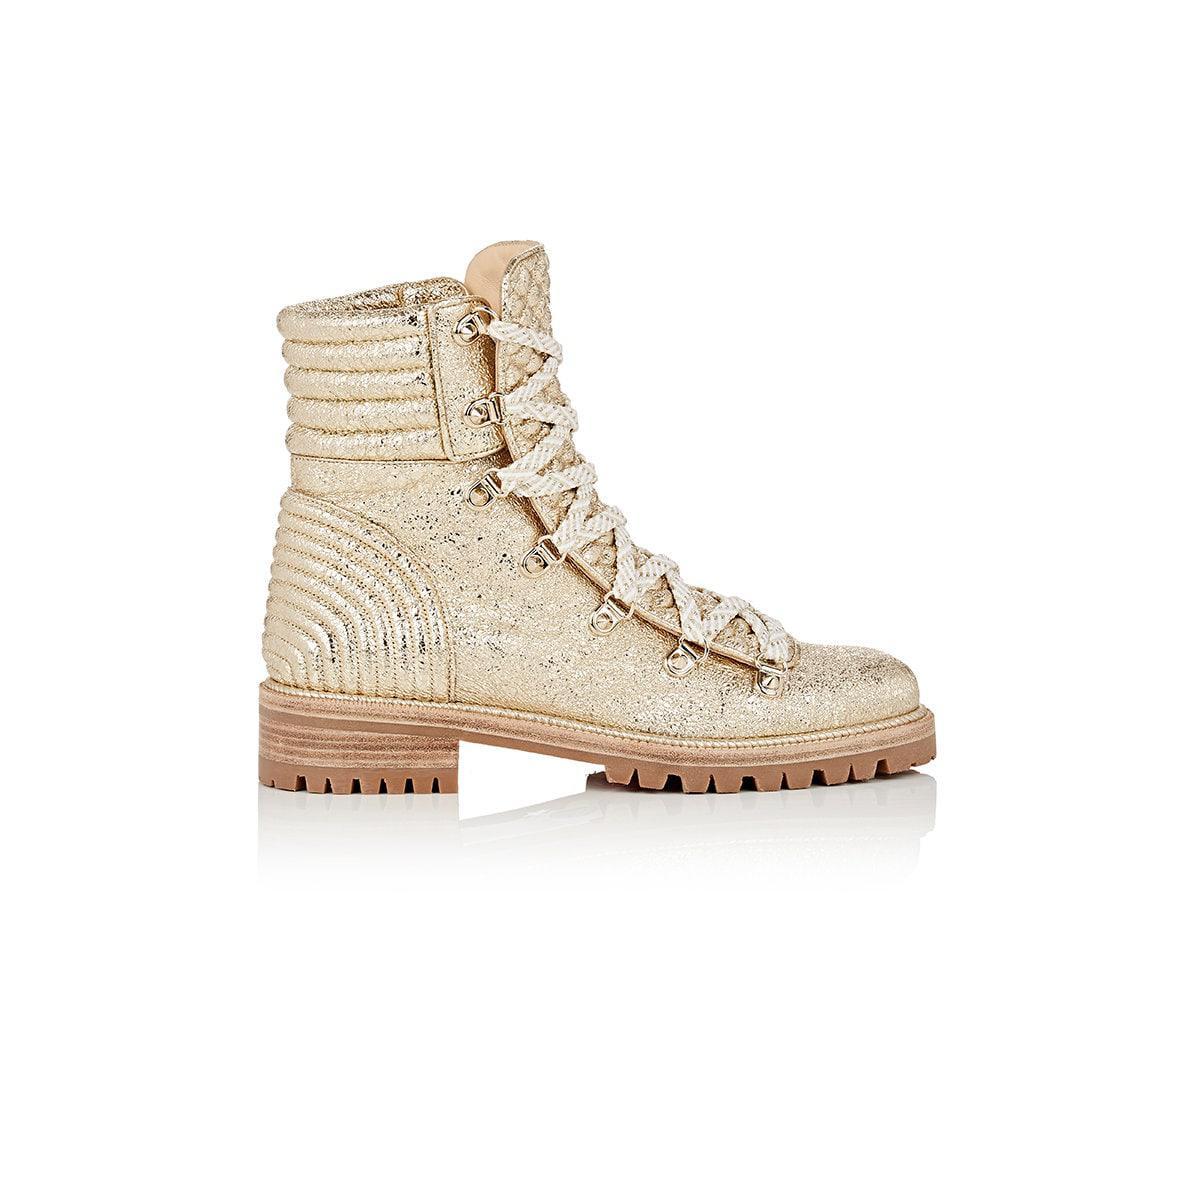 best service fbde3 d76b9 Women's Natural Mad Specchio Leather Boots